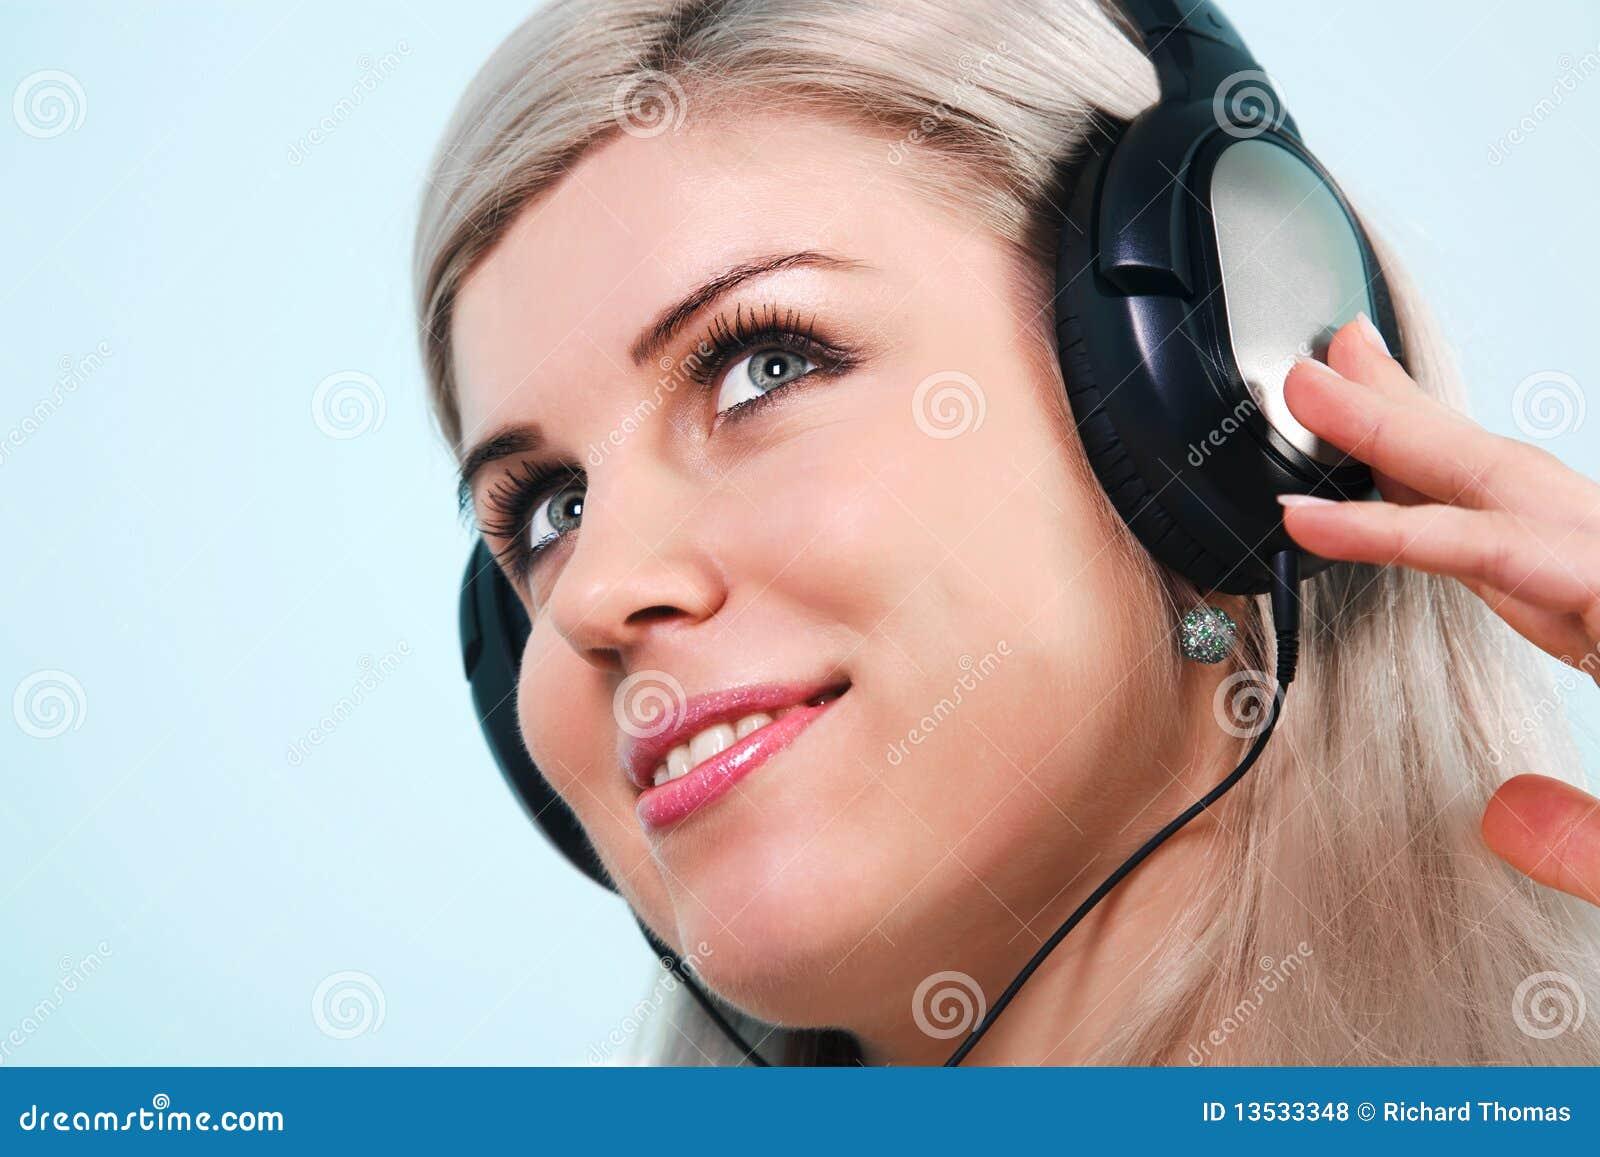 Woman Wearing Headphones Listening To Music Royalty Free ...